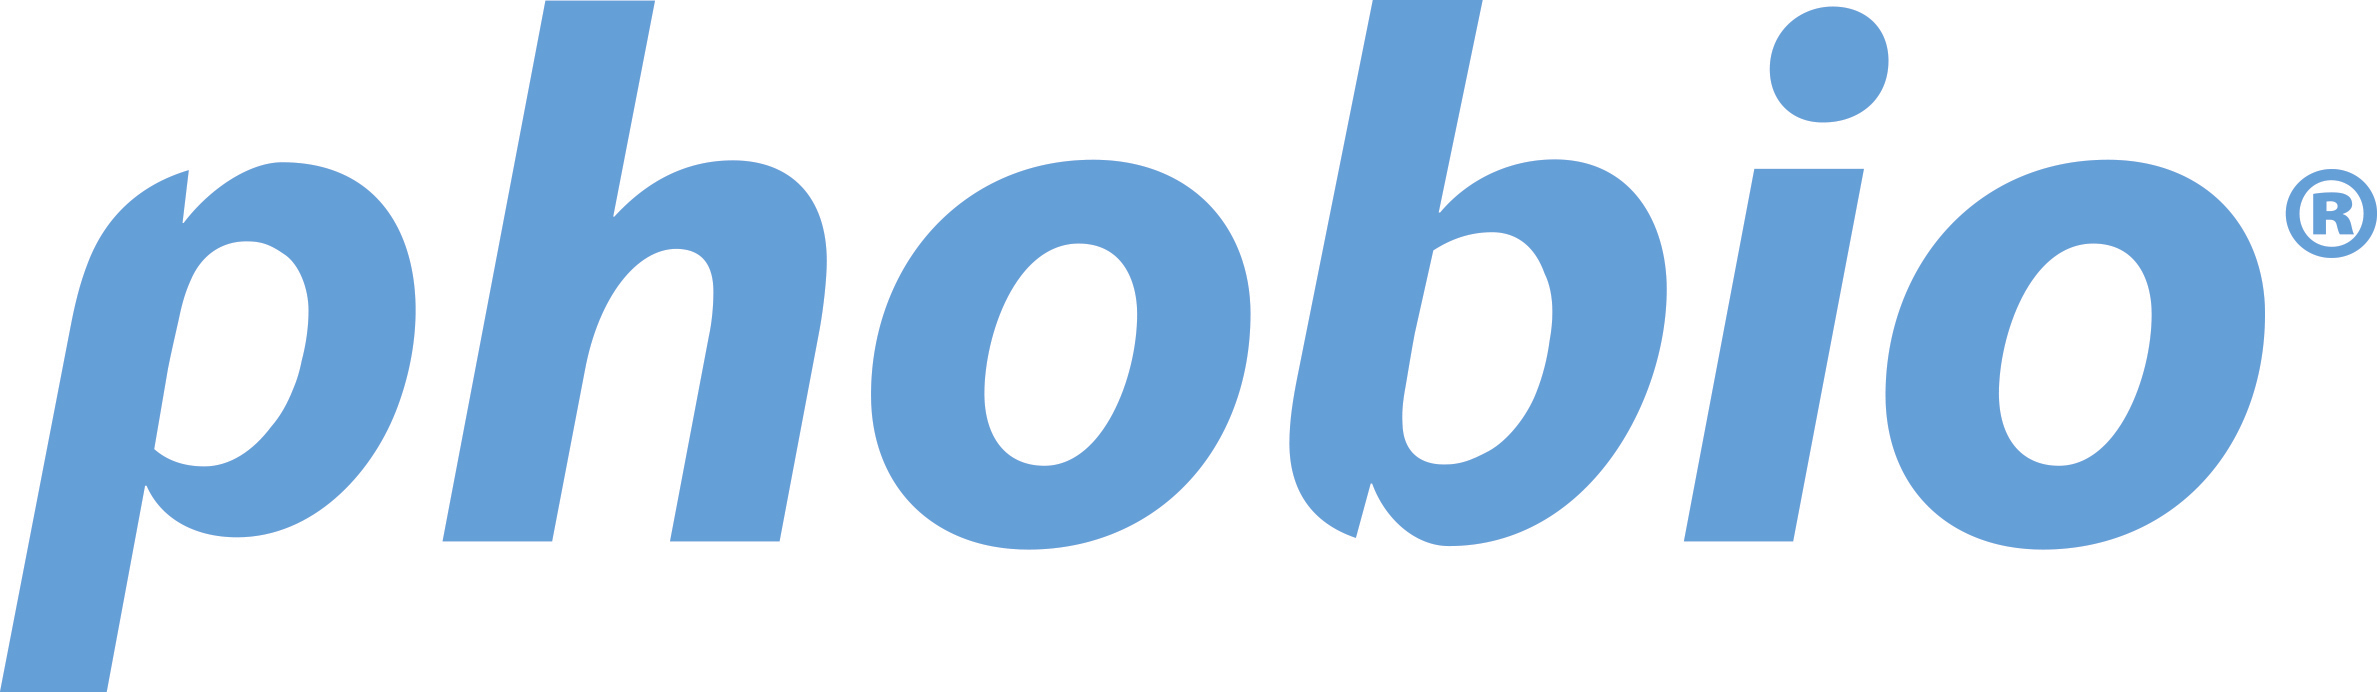 Phobio